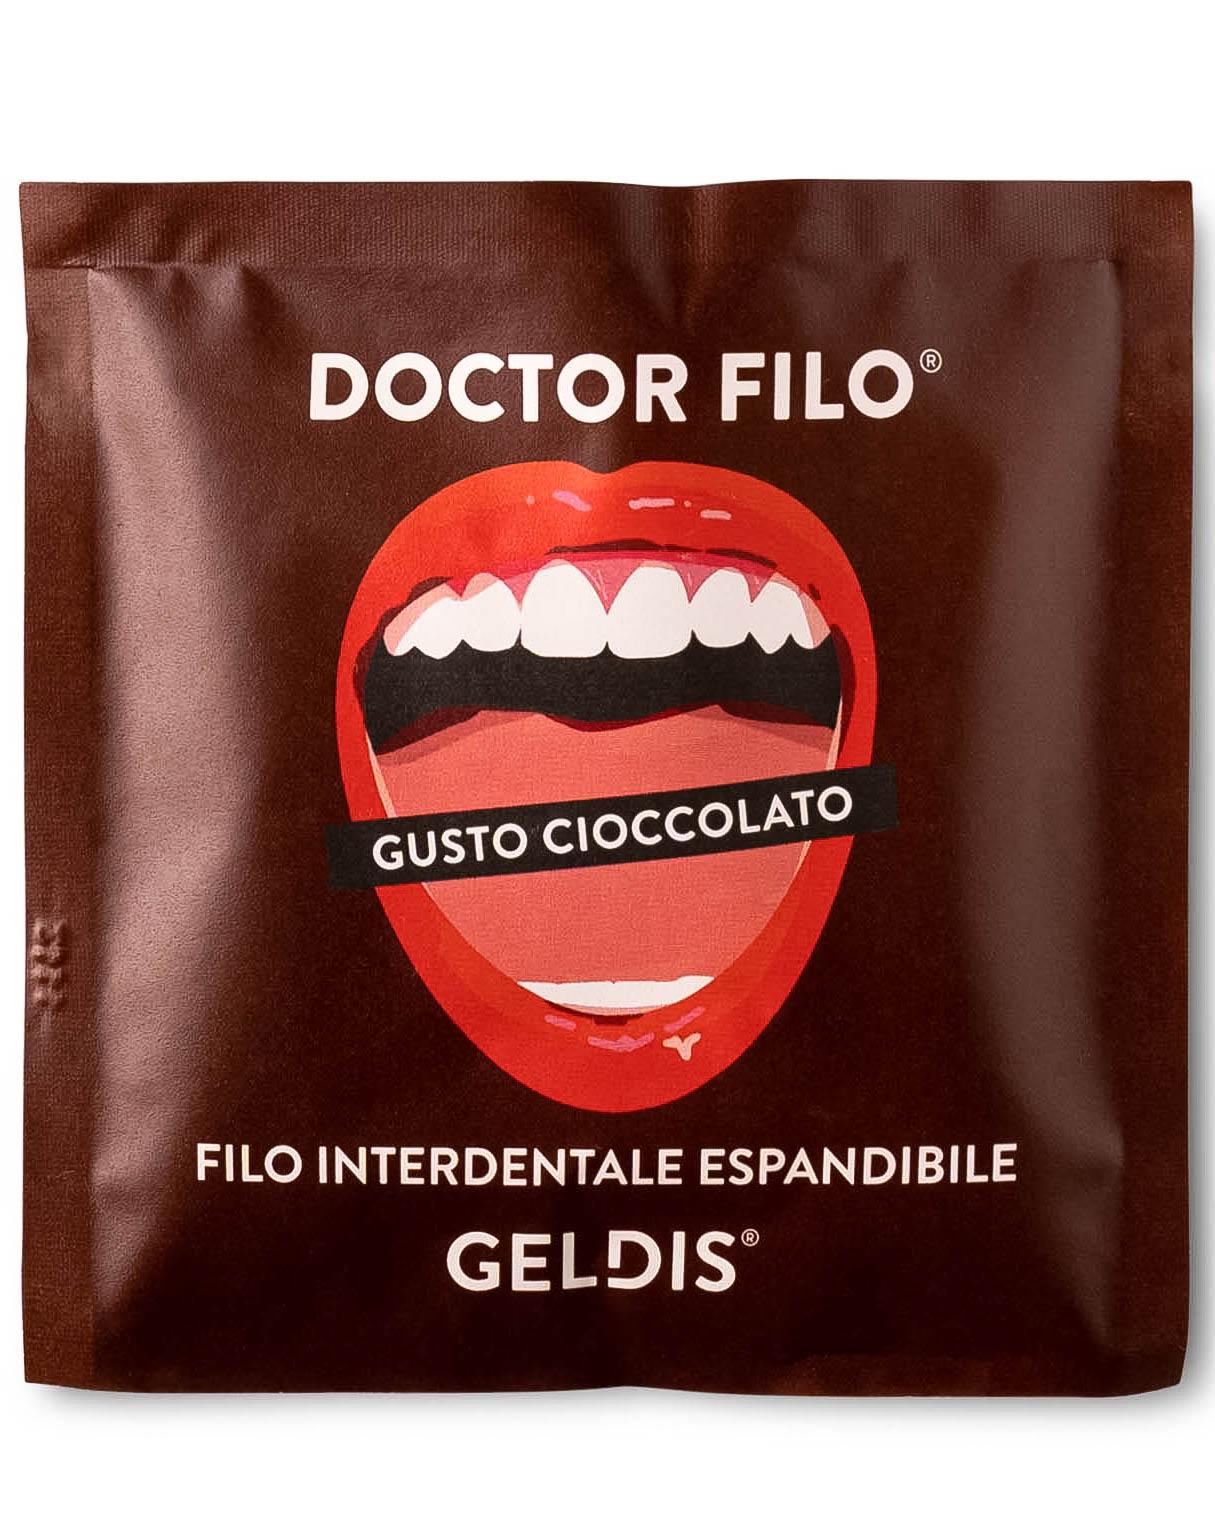 Geldis Doctor Filo Filo Interdentale Espandibile al Cioccolato – 30 mt